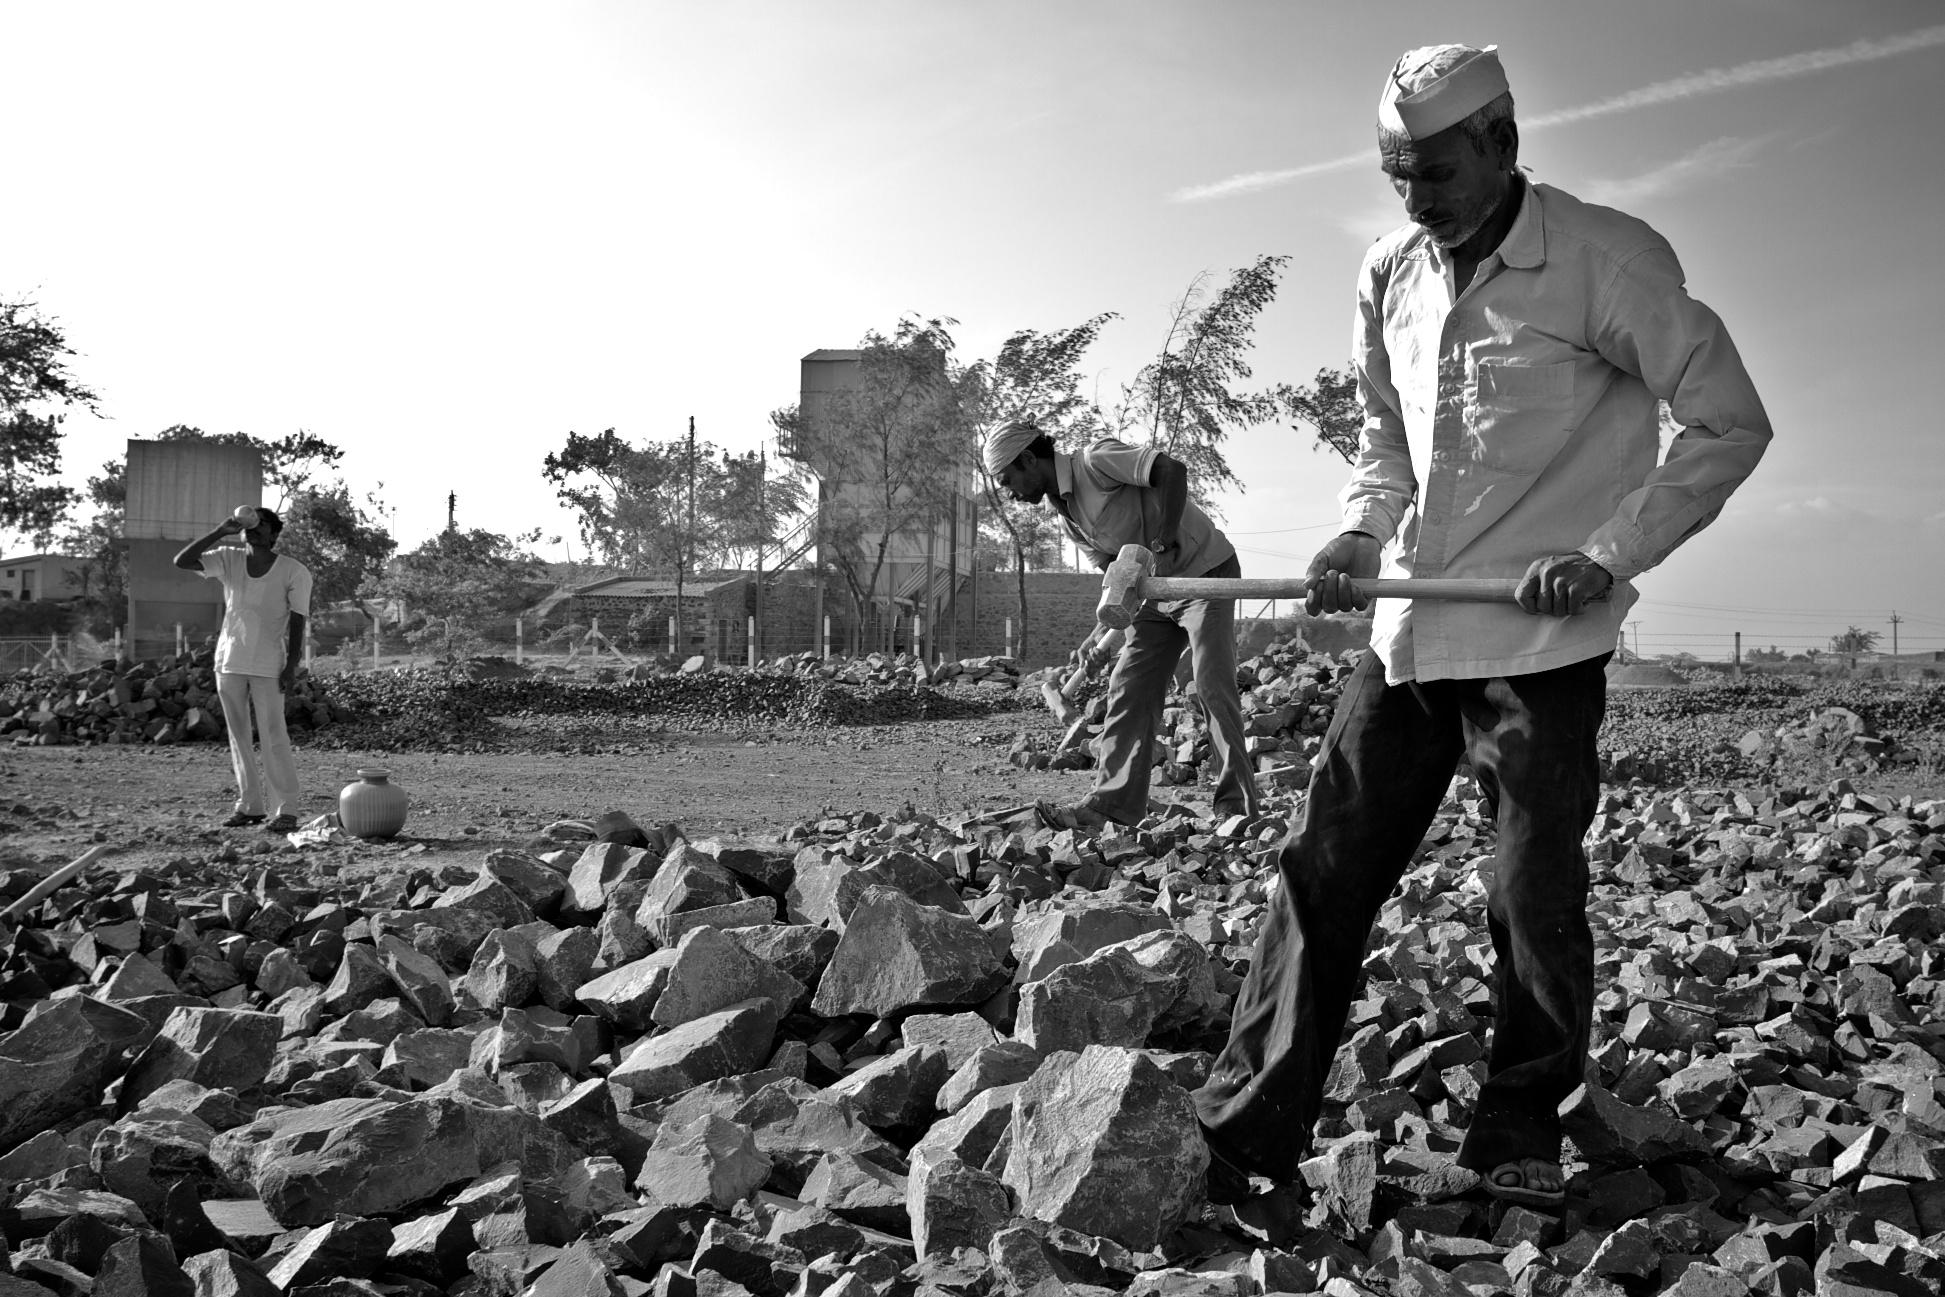 man breaking rocks in India-rural poverty